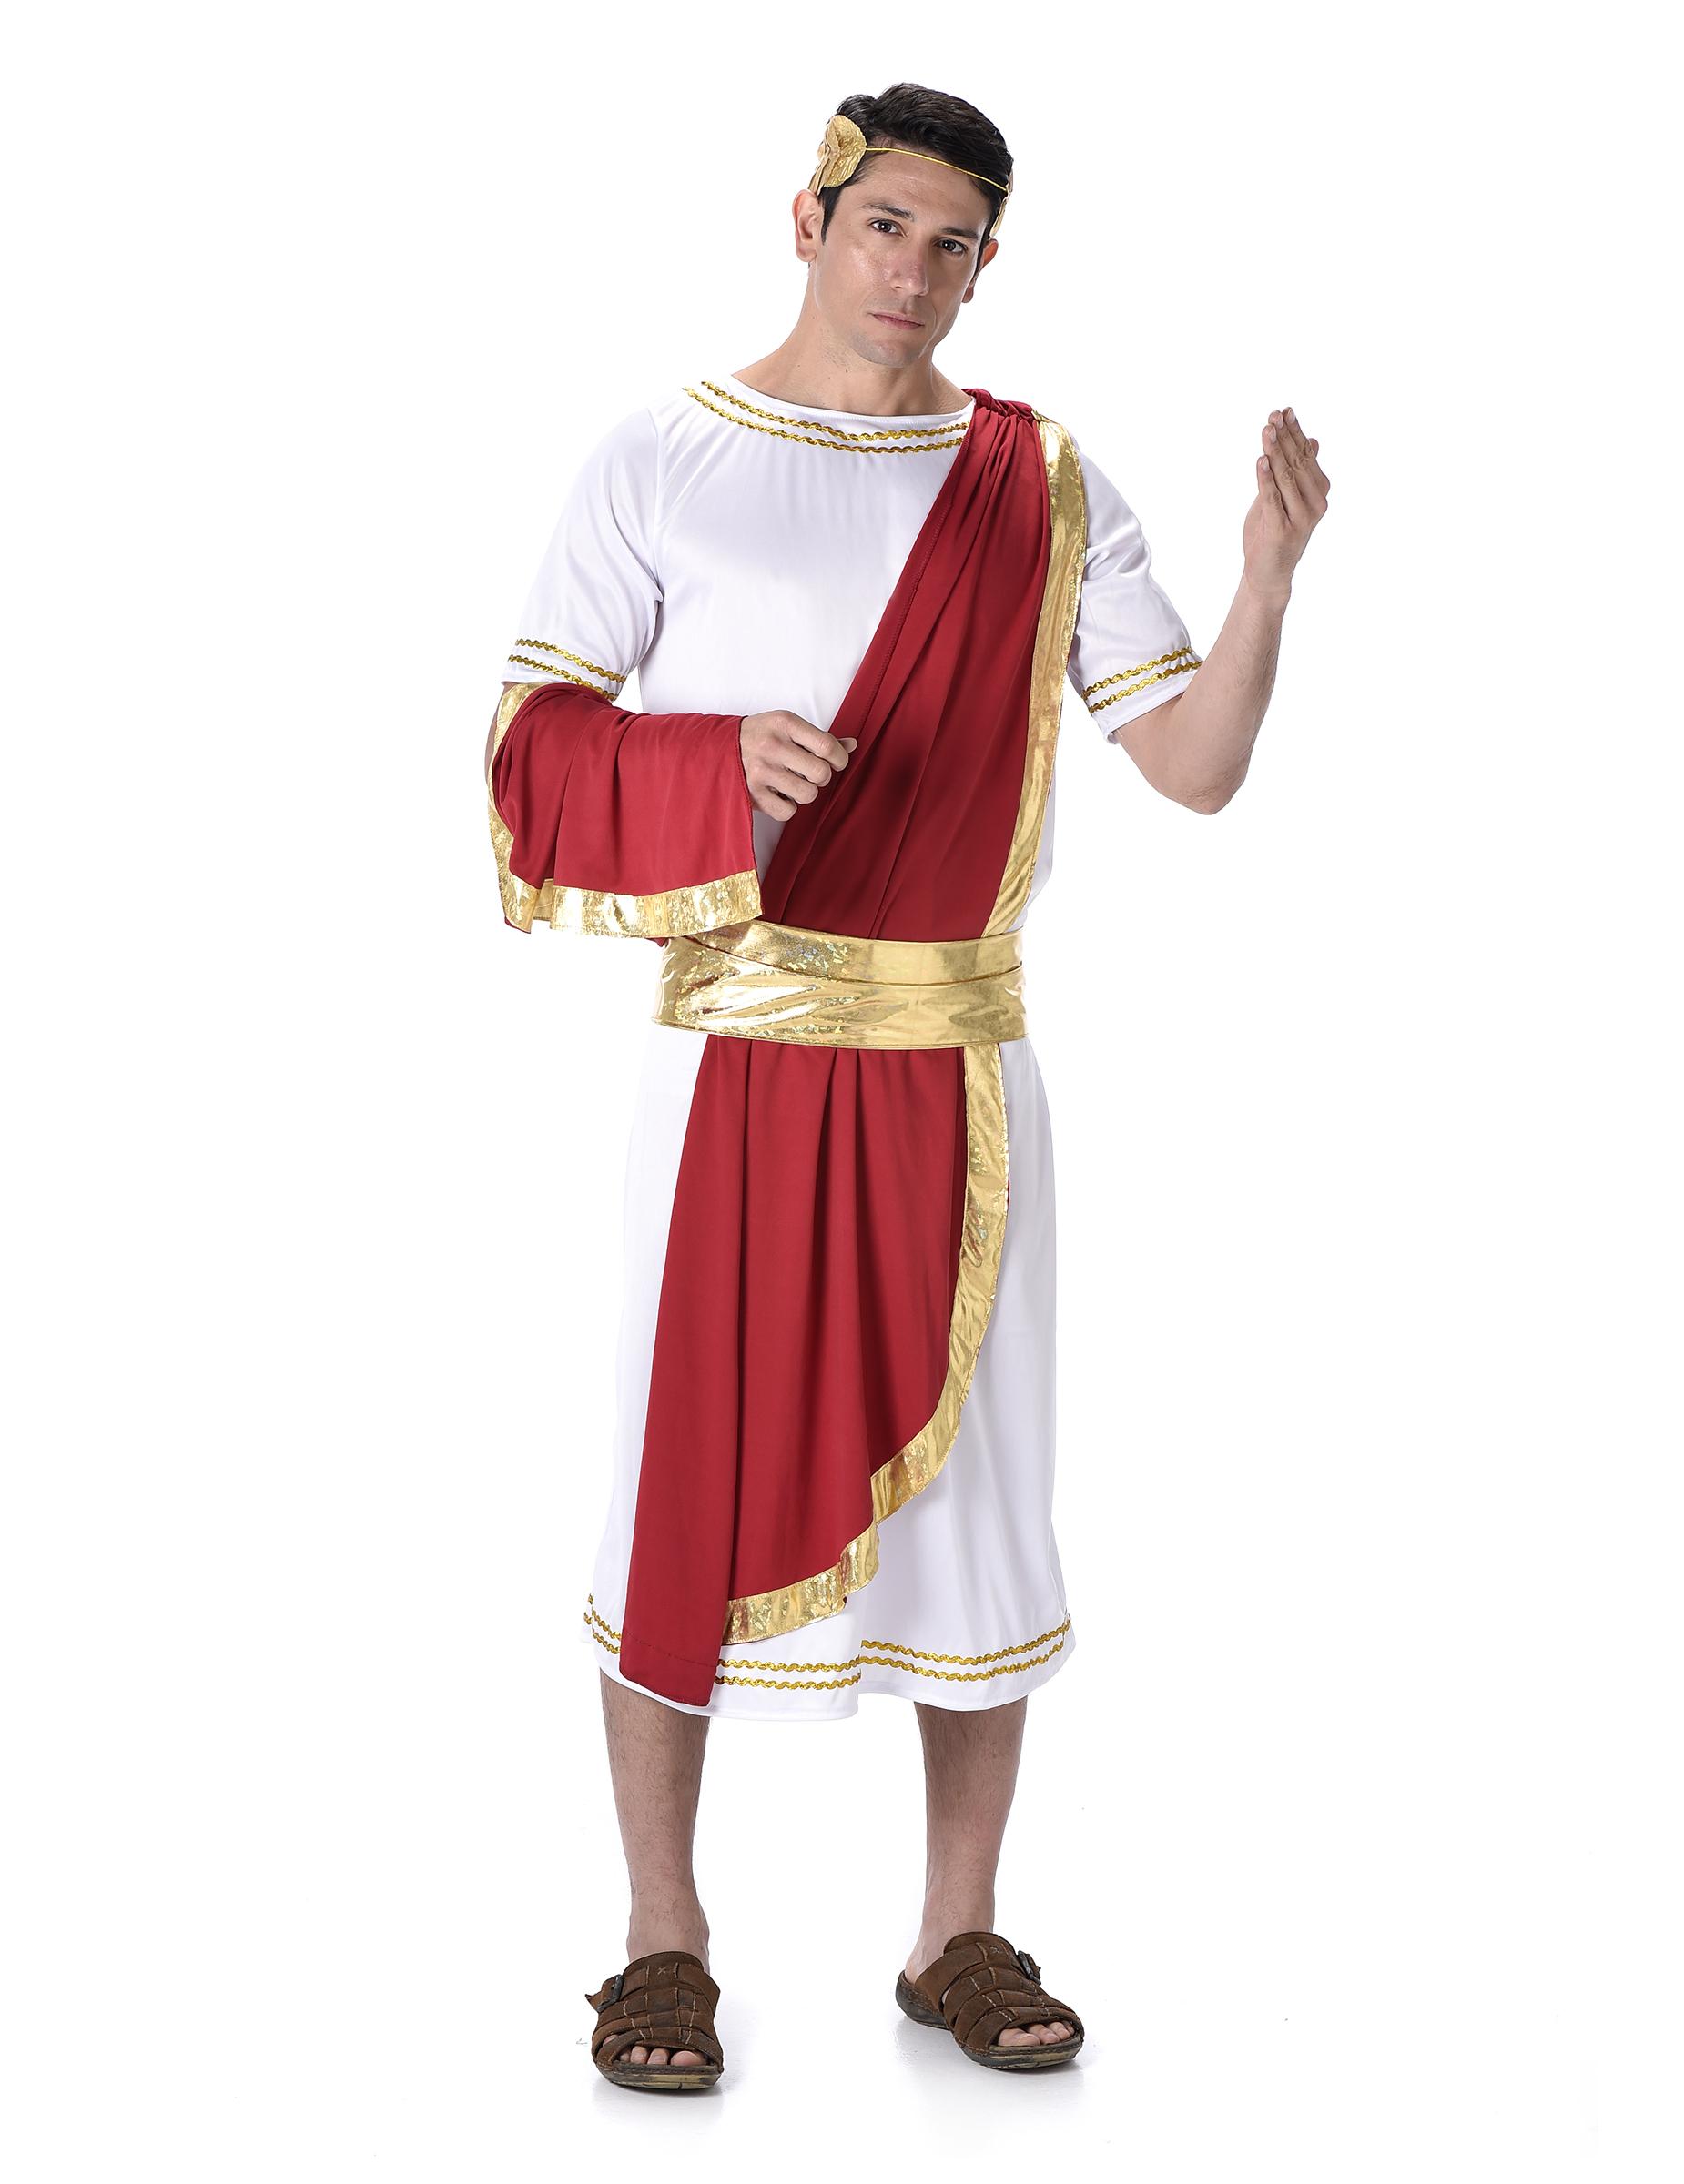 http://cdn.deguisetoi.fr/images/rep_art/gra/234/1/234108/deguisement-empereur-romain-homme_234108.JPG